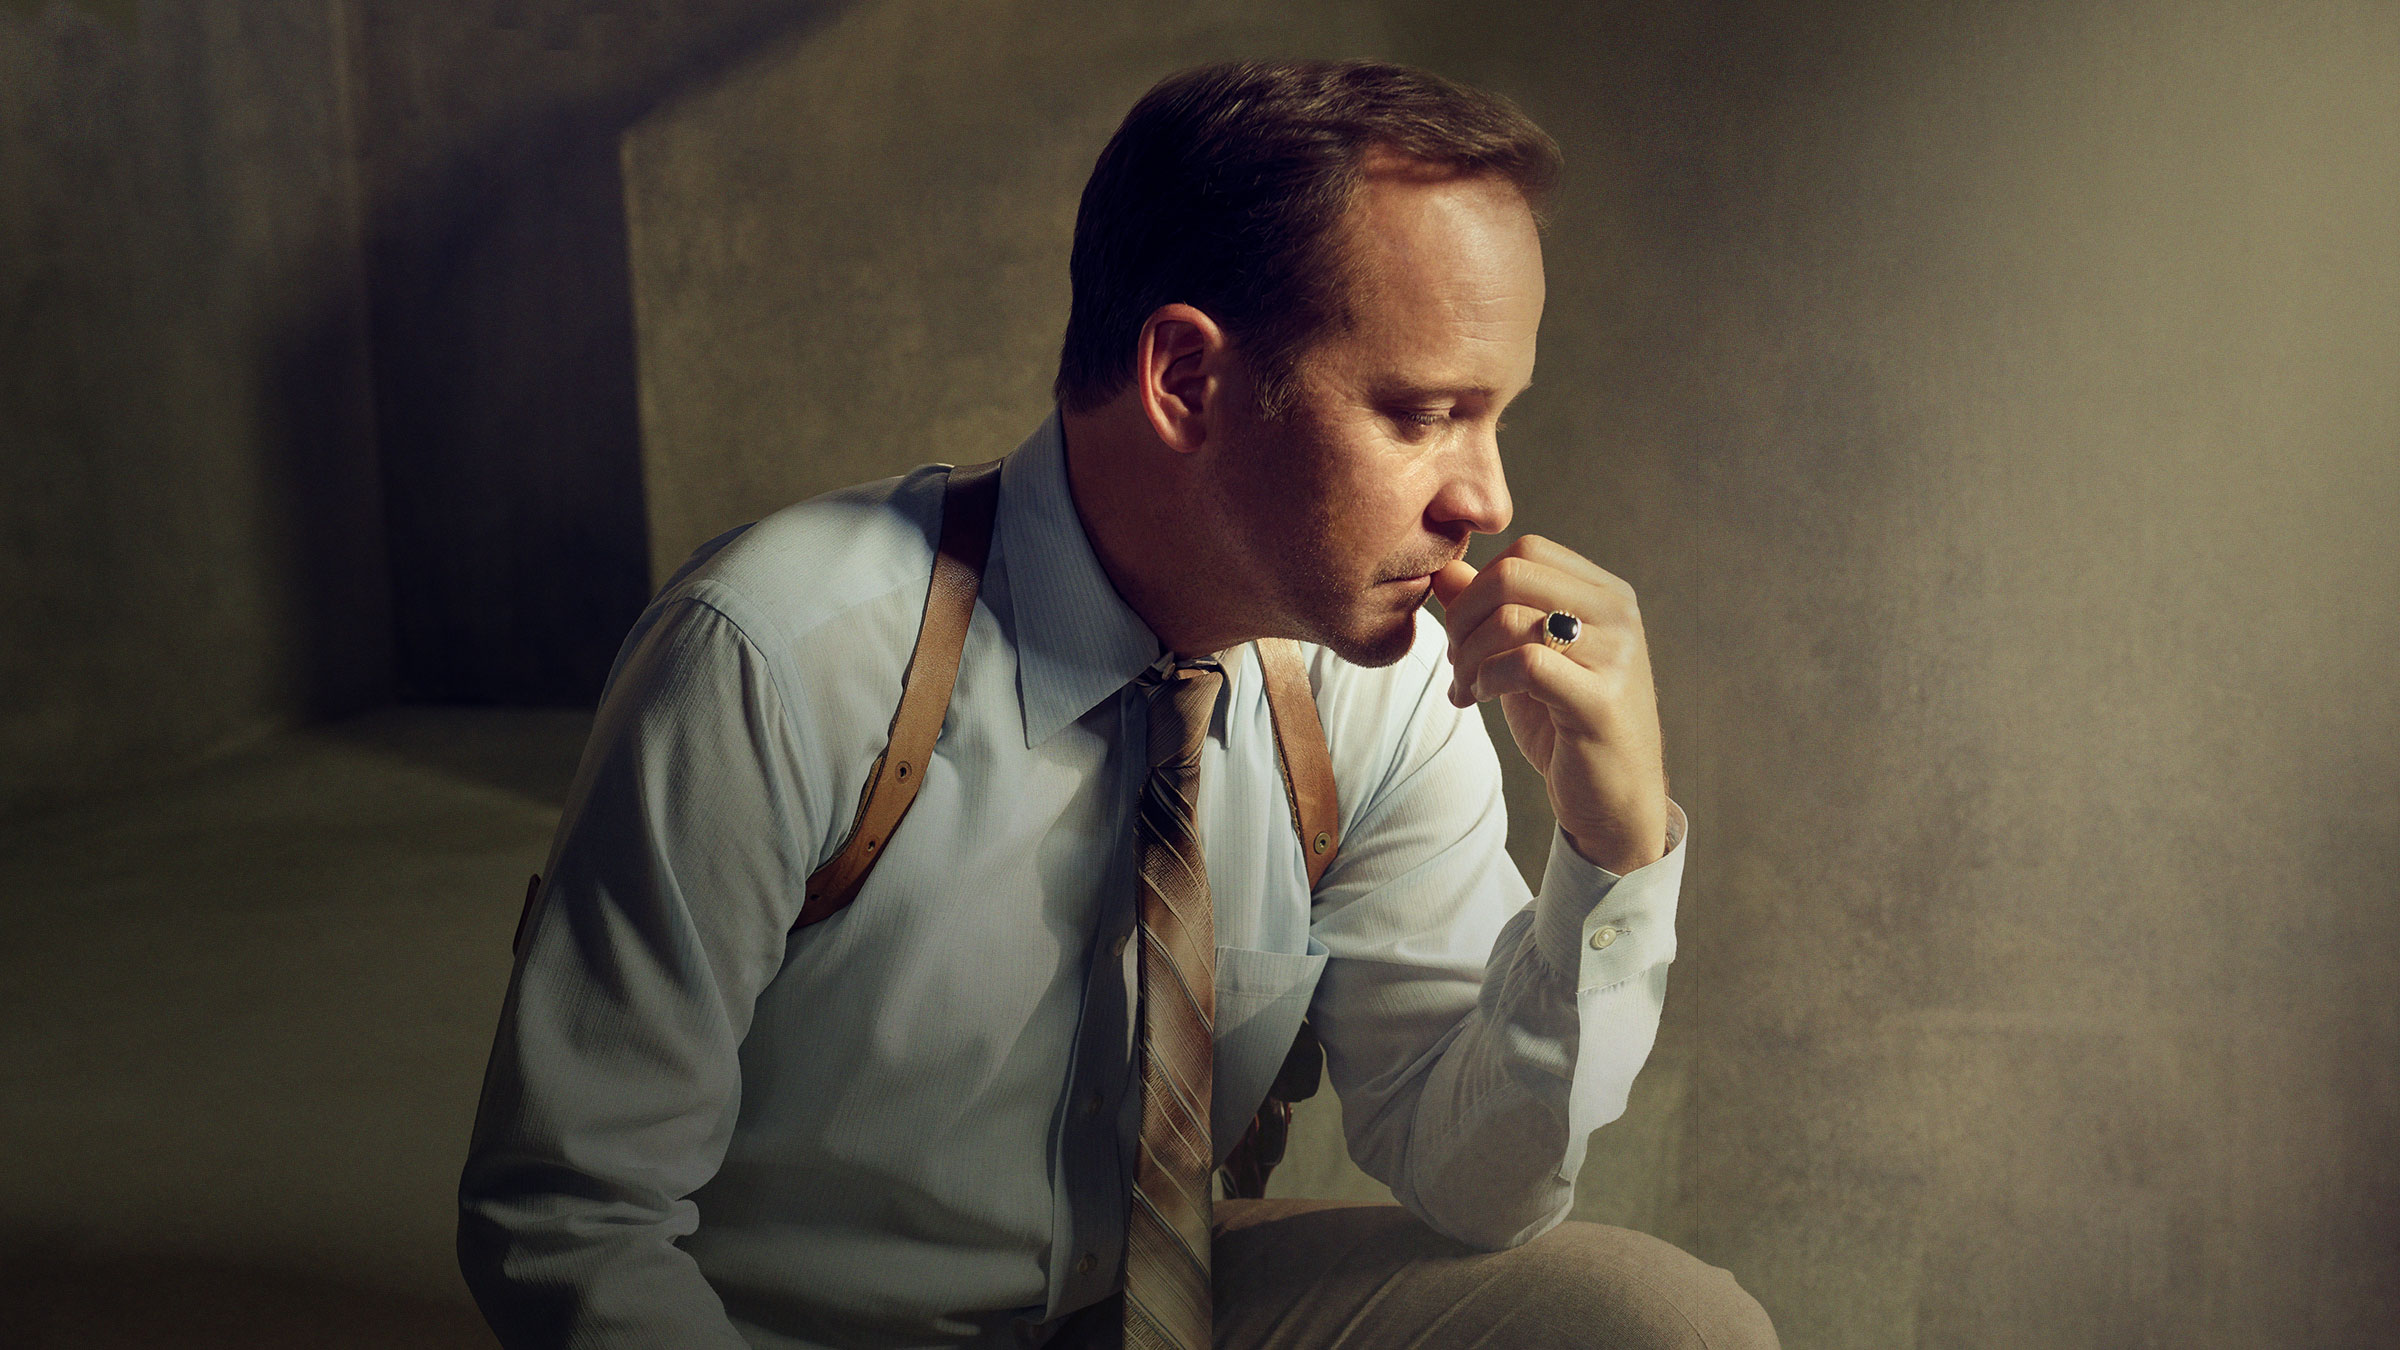 Peter Sarsgaard as Det. David Russell